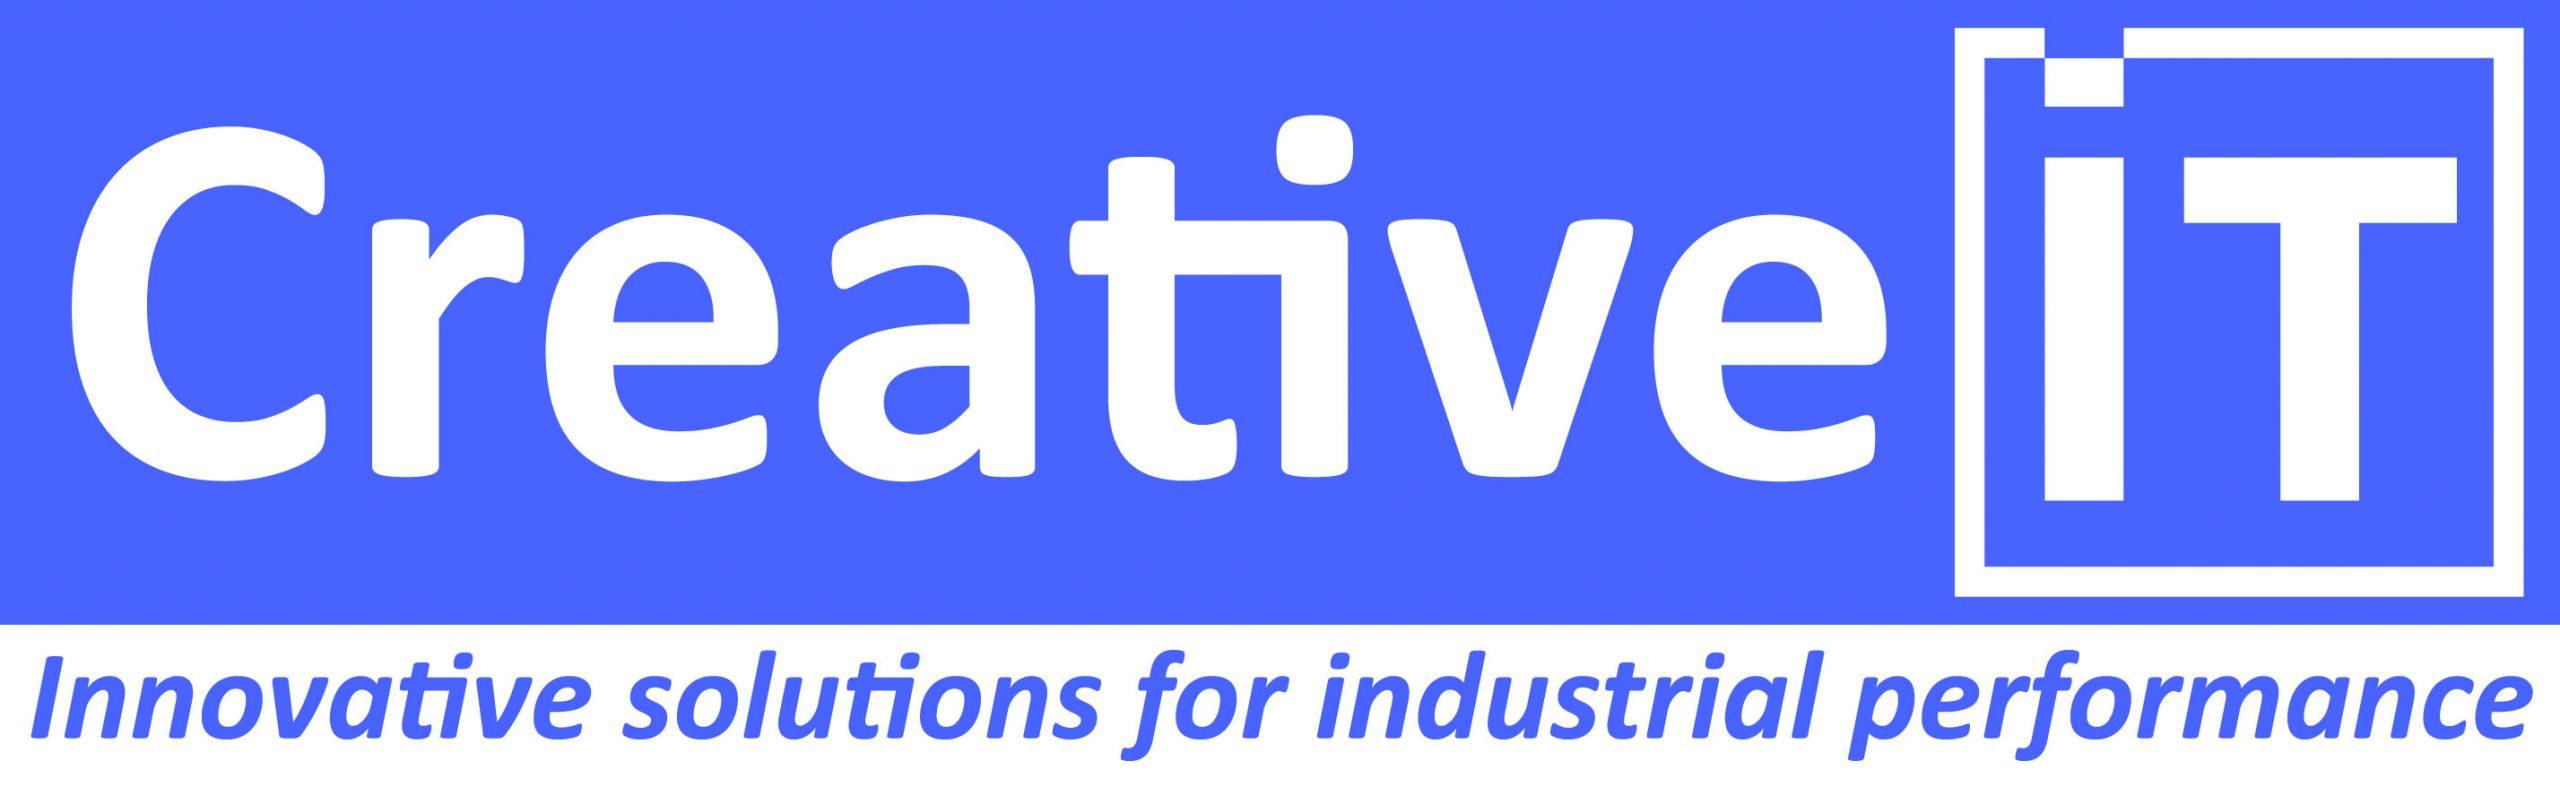 Logo CreativeIT 2020 RVB FINAL scaled 1